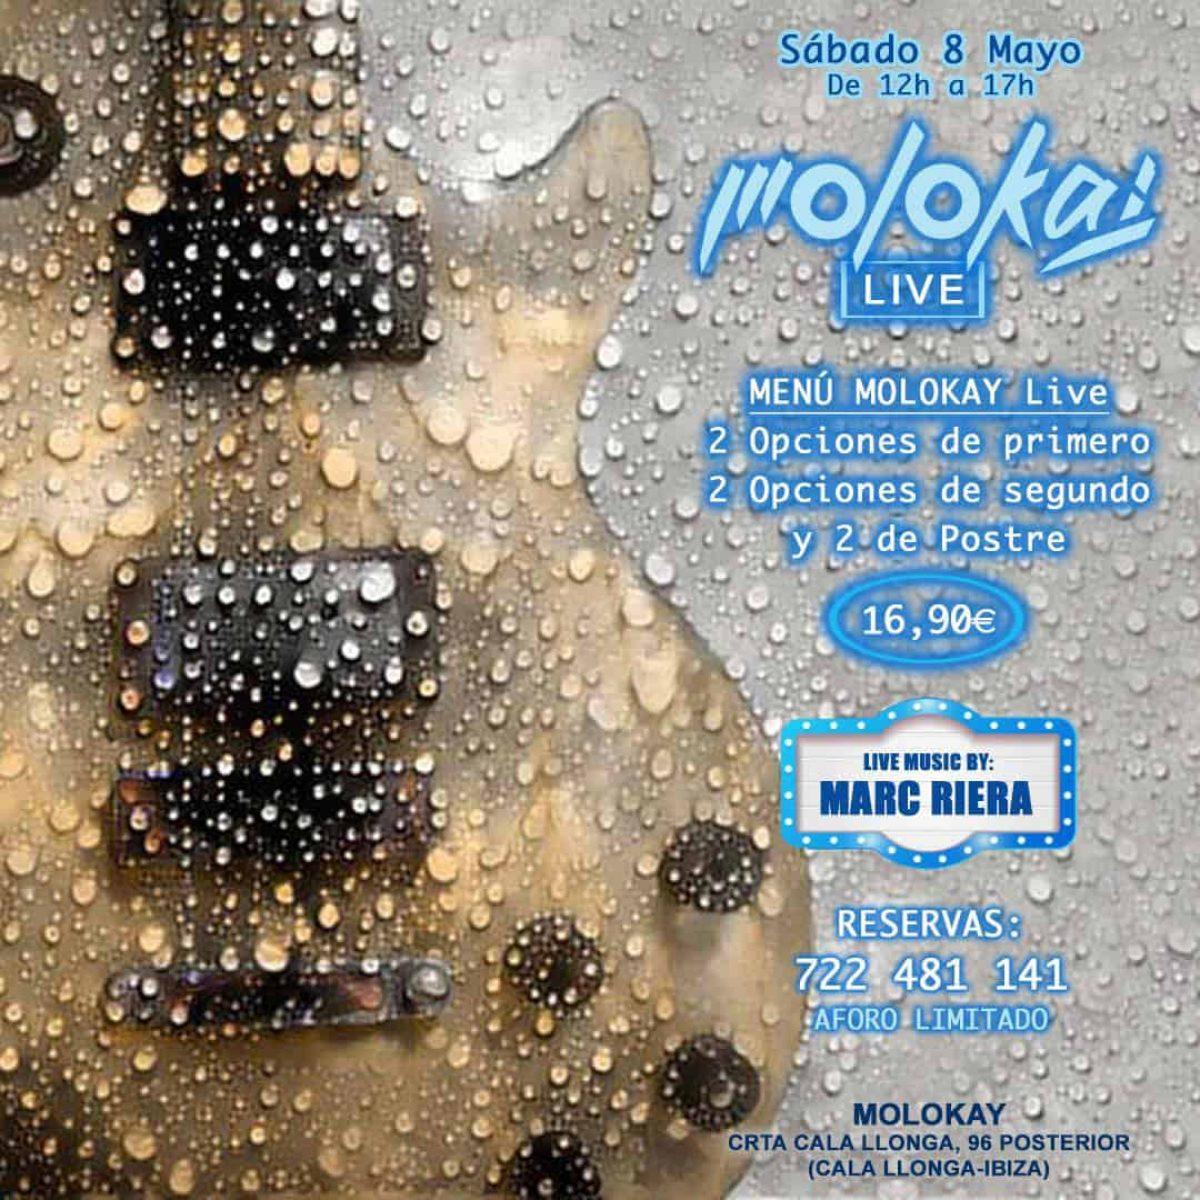 restaurant-molokay-Eivissa-marc-riera-2021-welcometoibiza